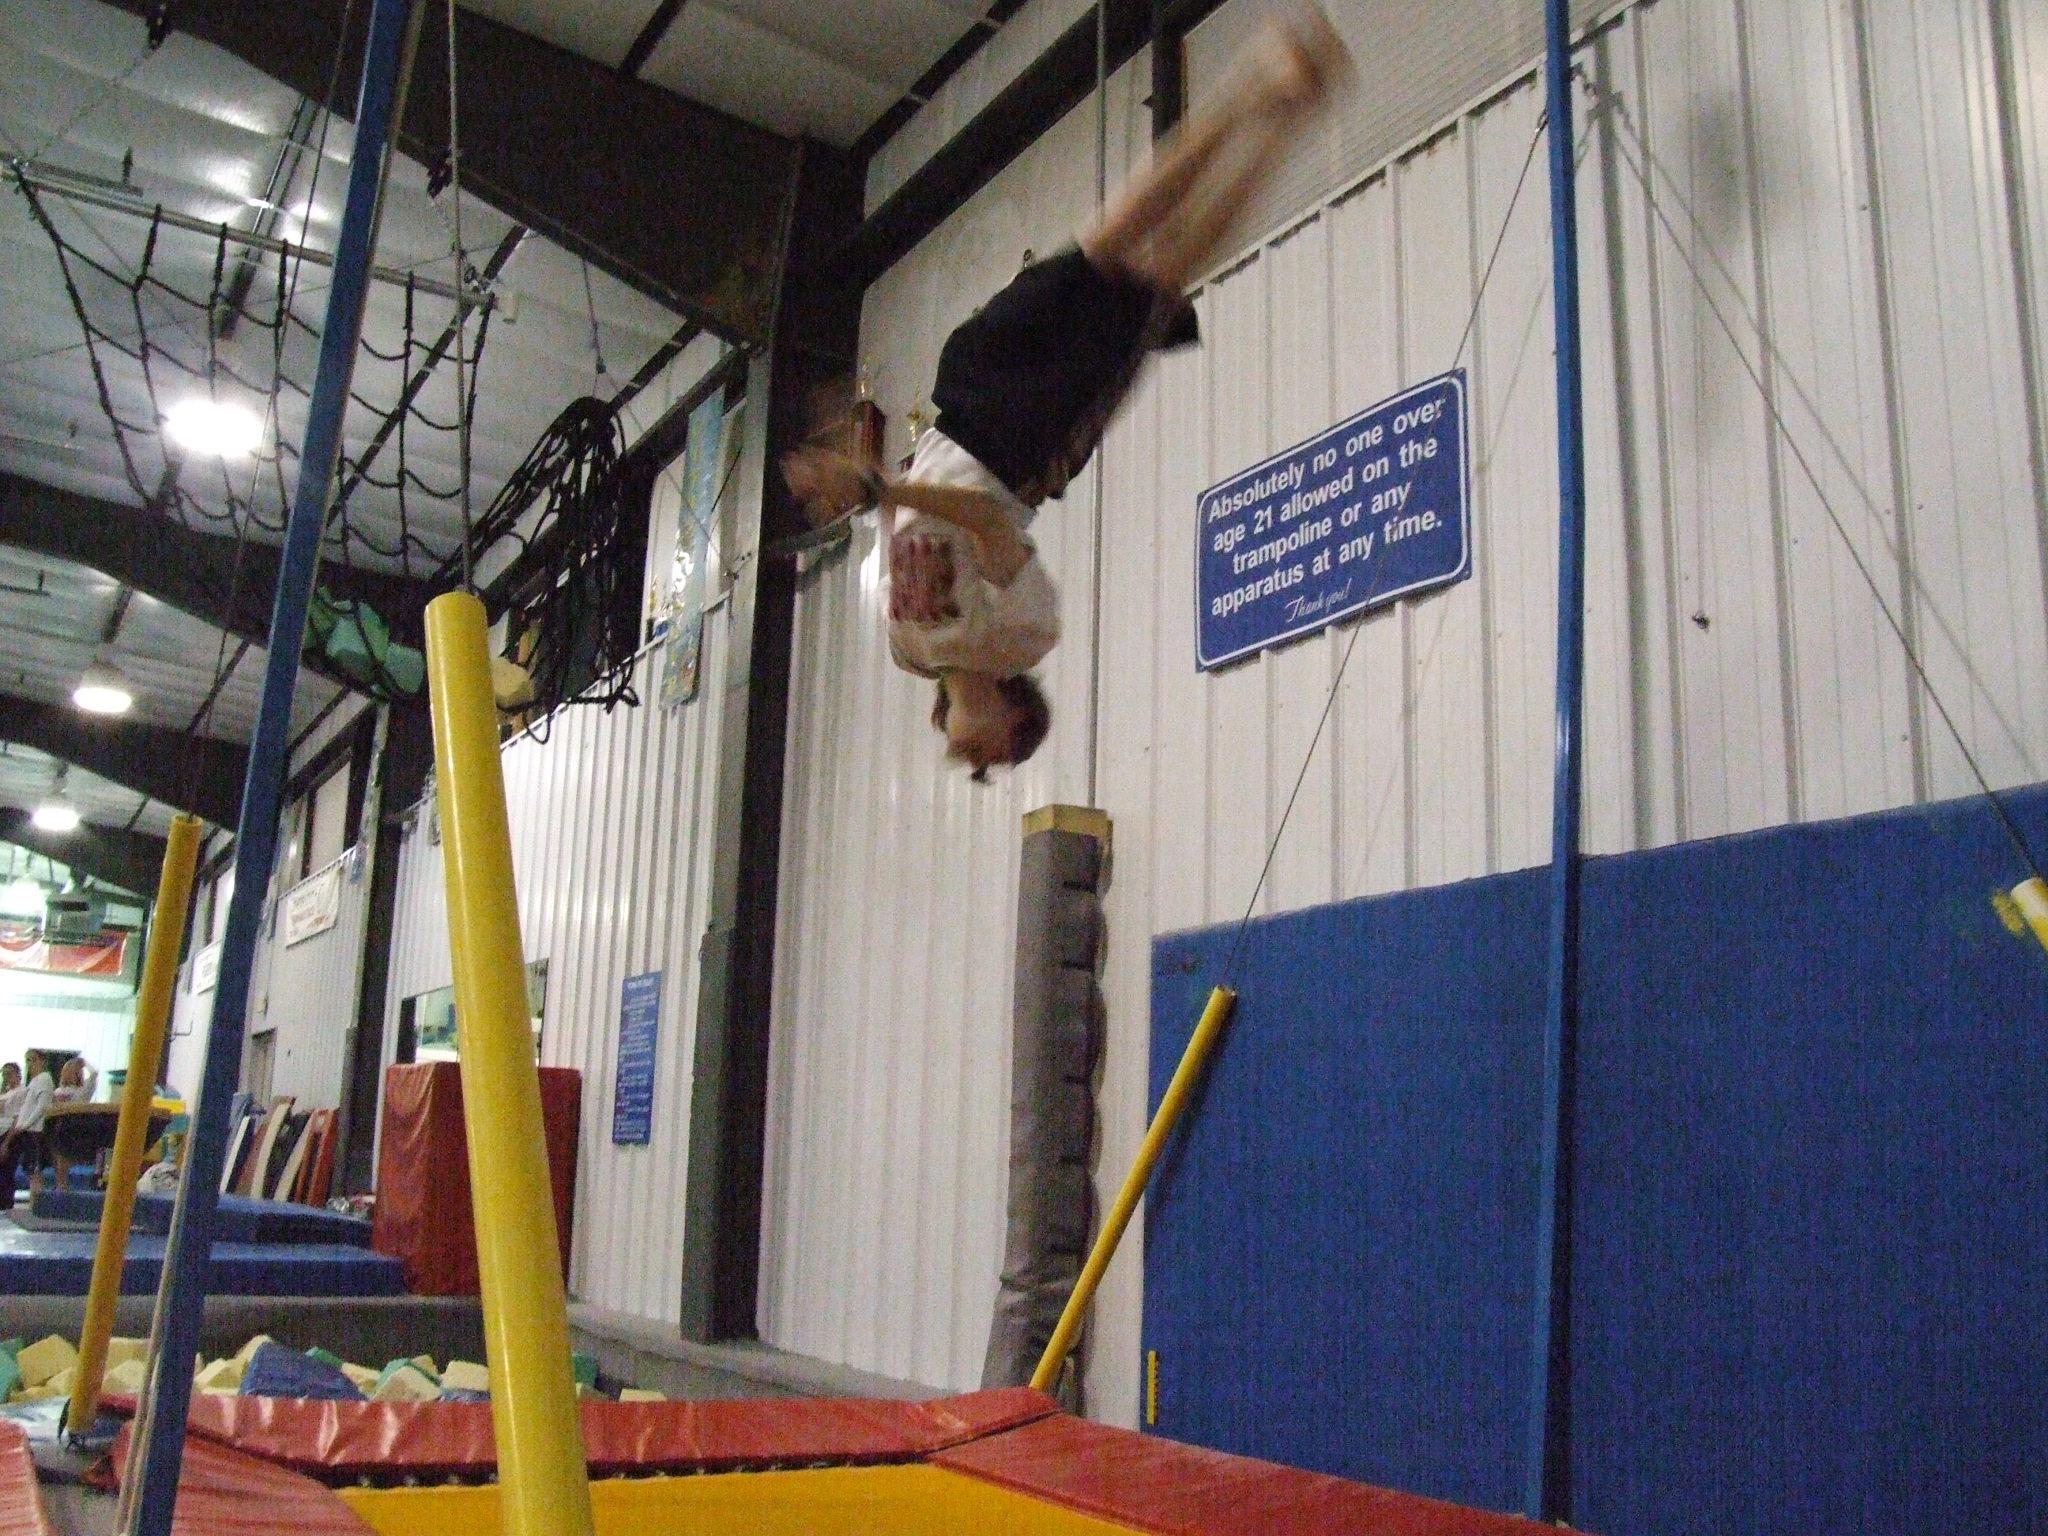 Steven Queoff trains on the trampoline